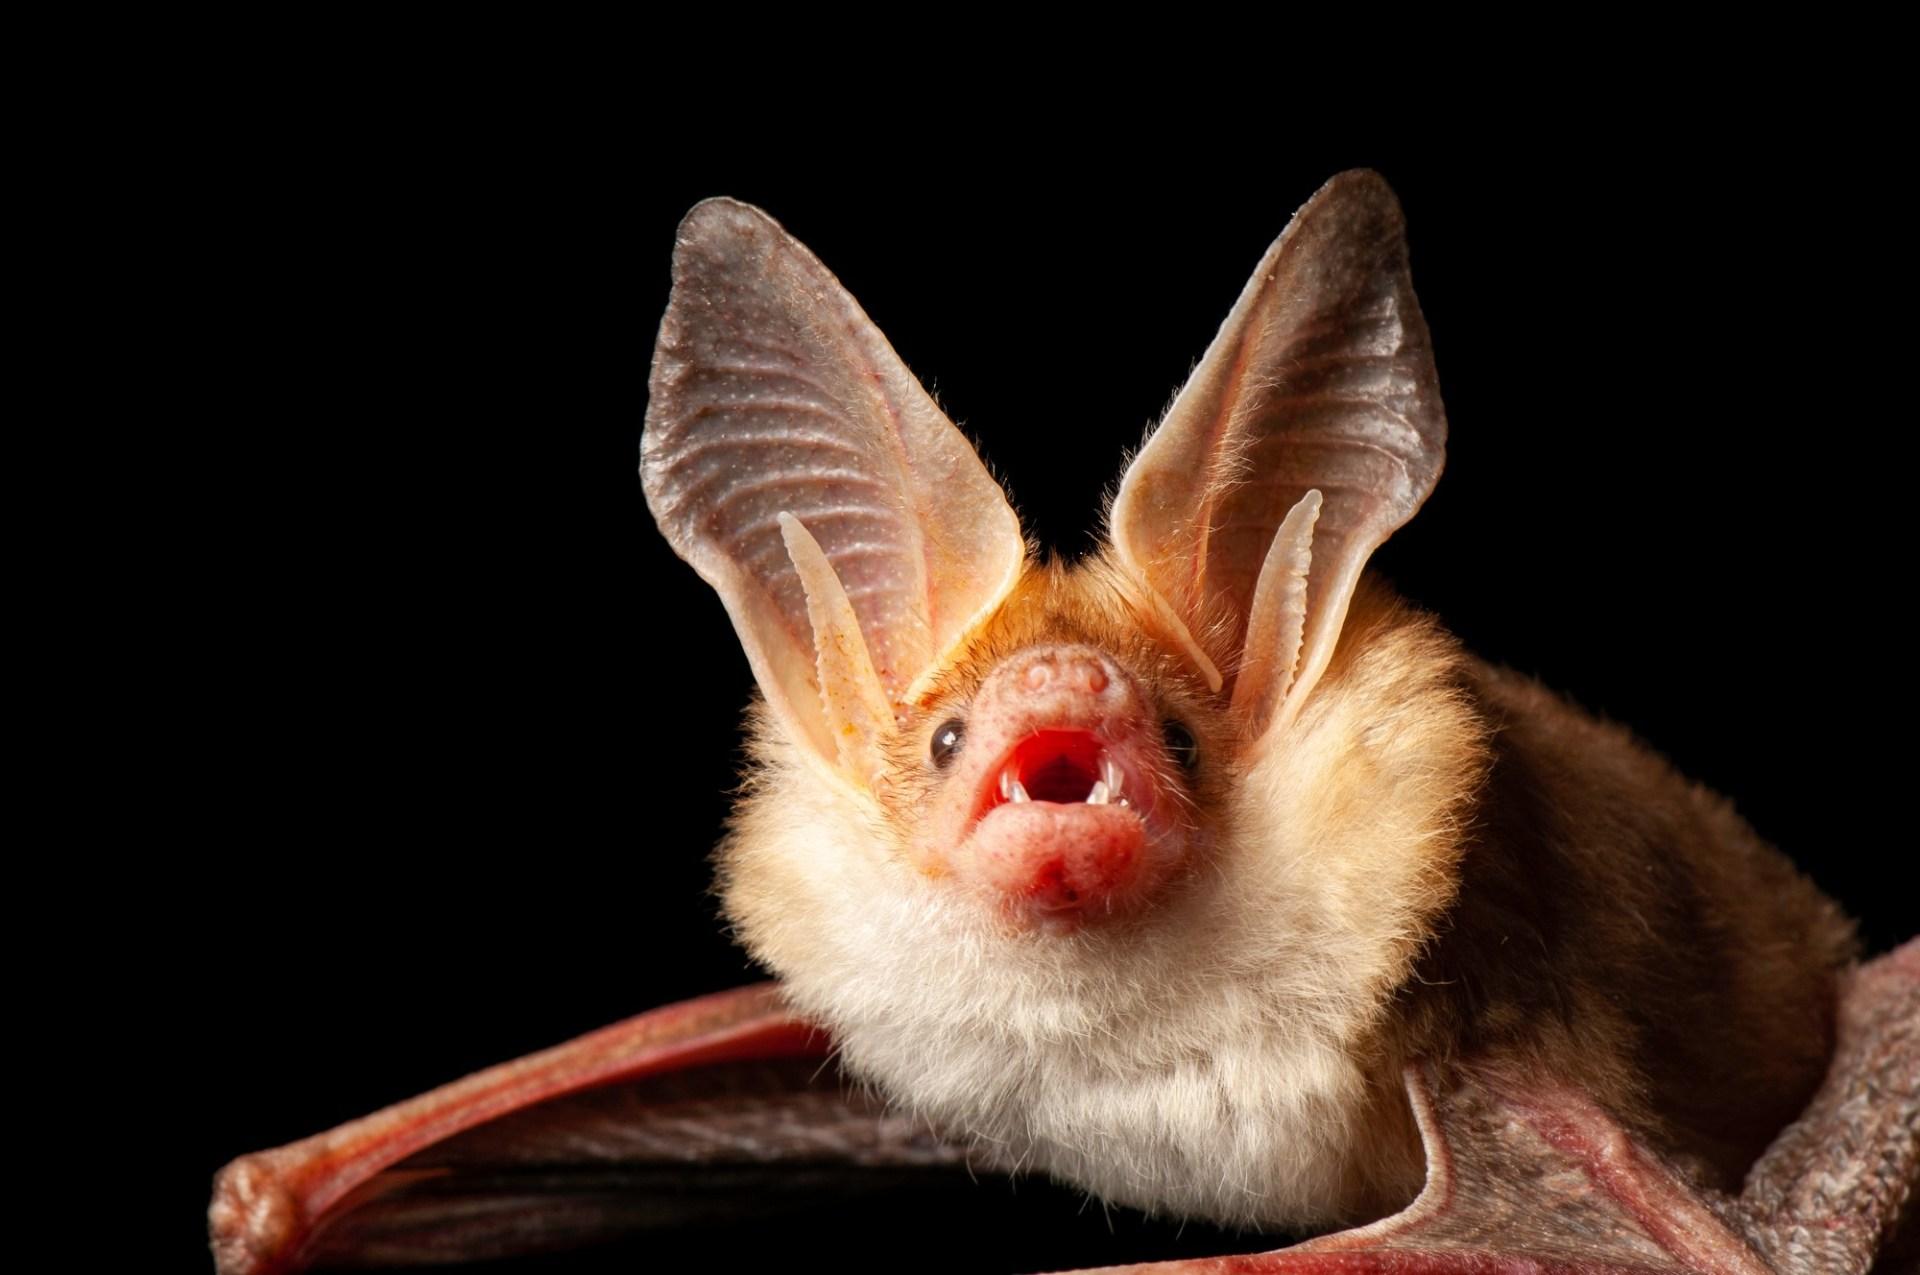 A pallid bat (Antrozous pallidus) at the North Carolina Zoo, Asheboro, North Carolina.